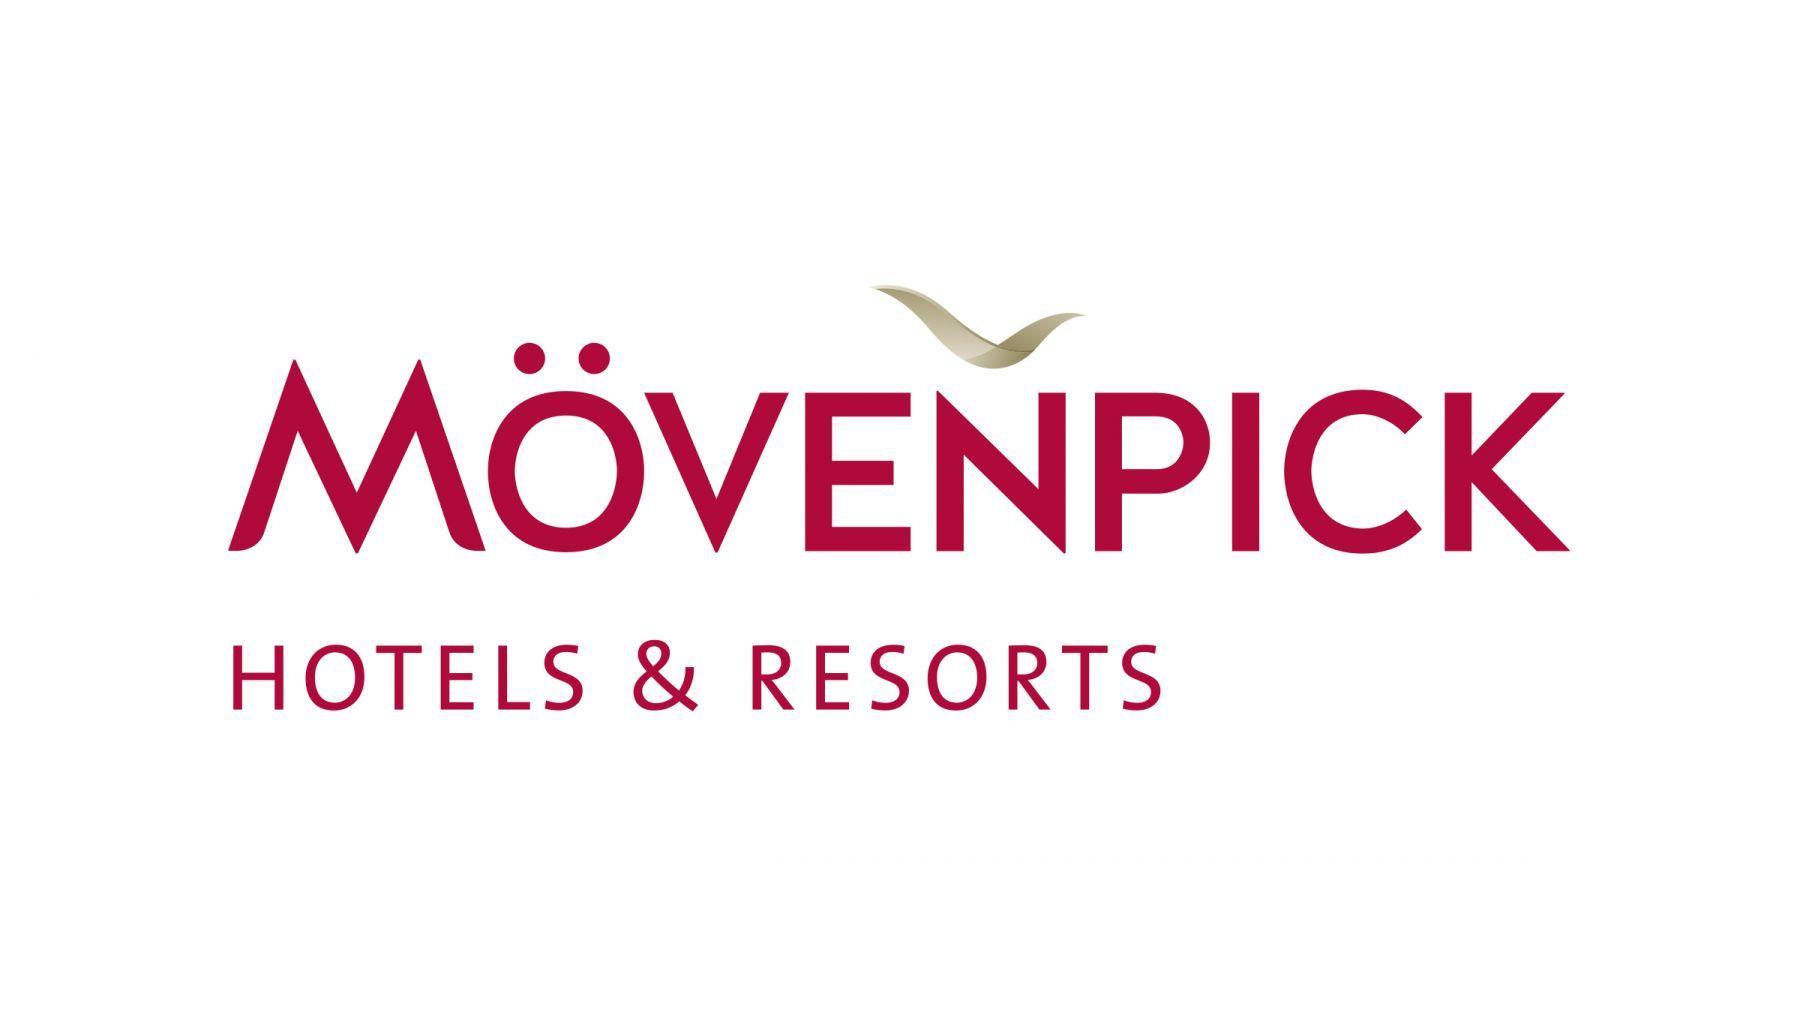 MOVENPICK -